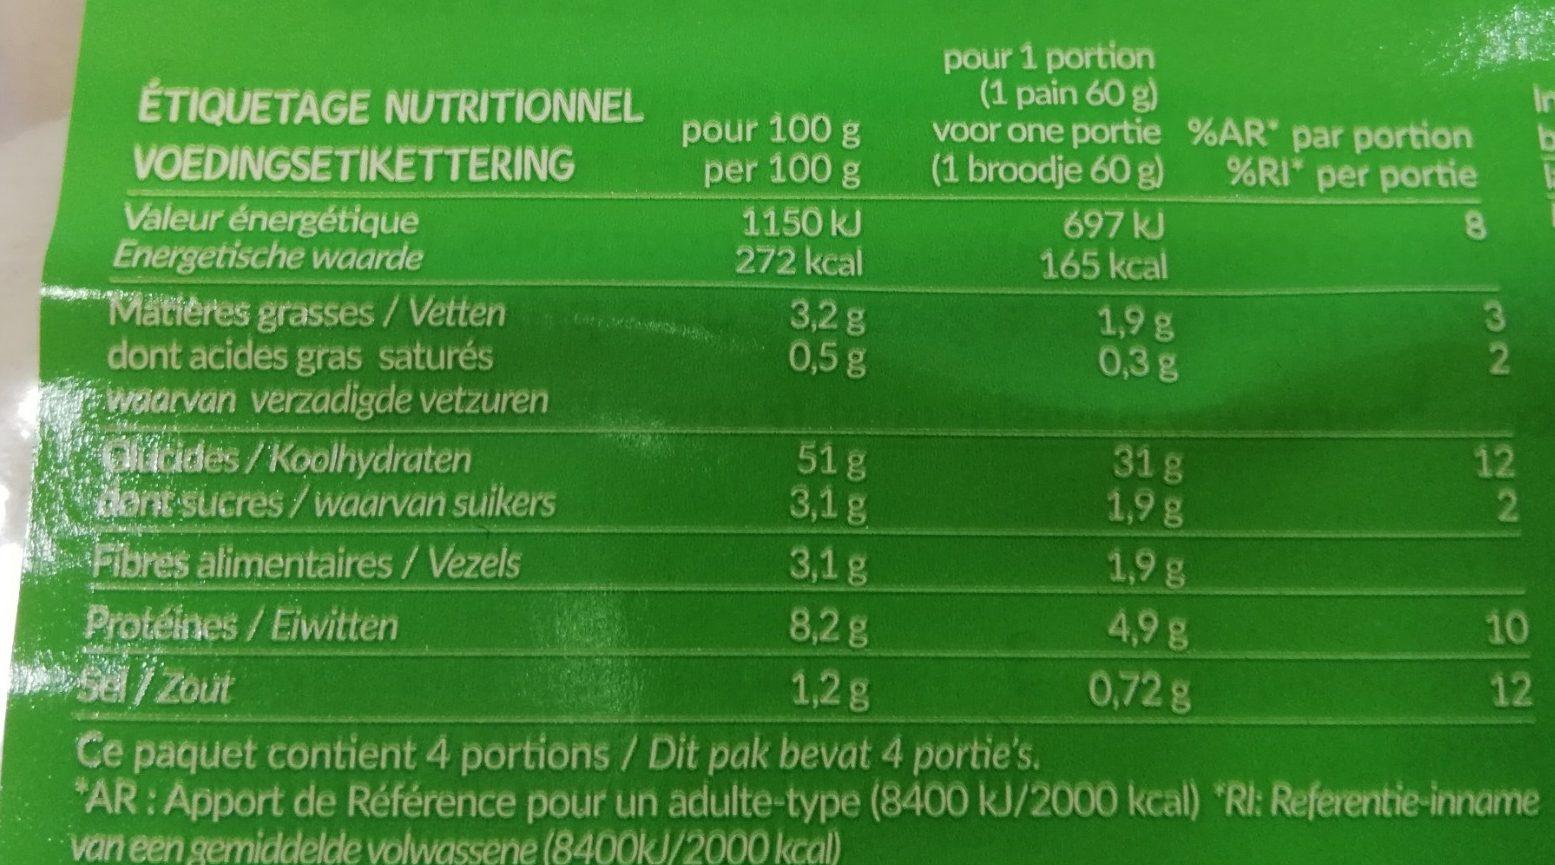 Panini - Información nutricional